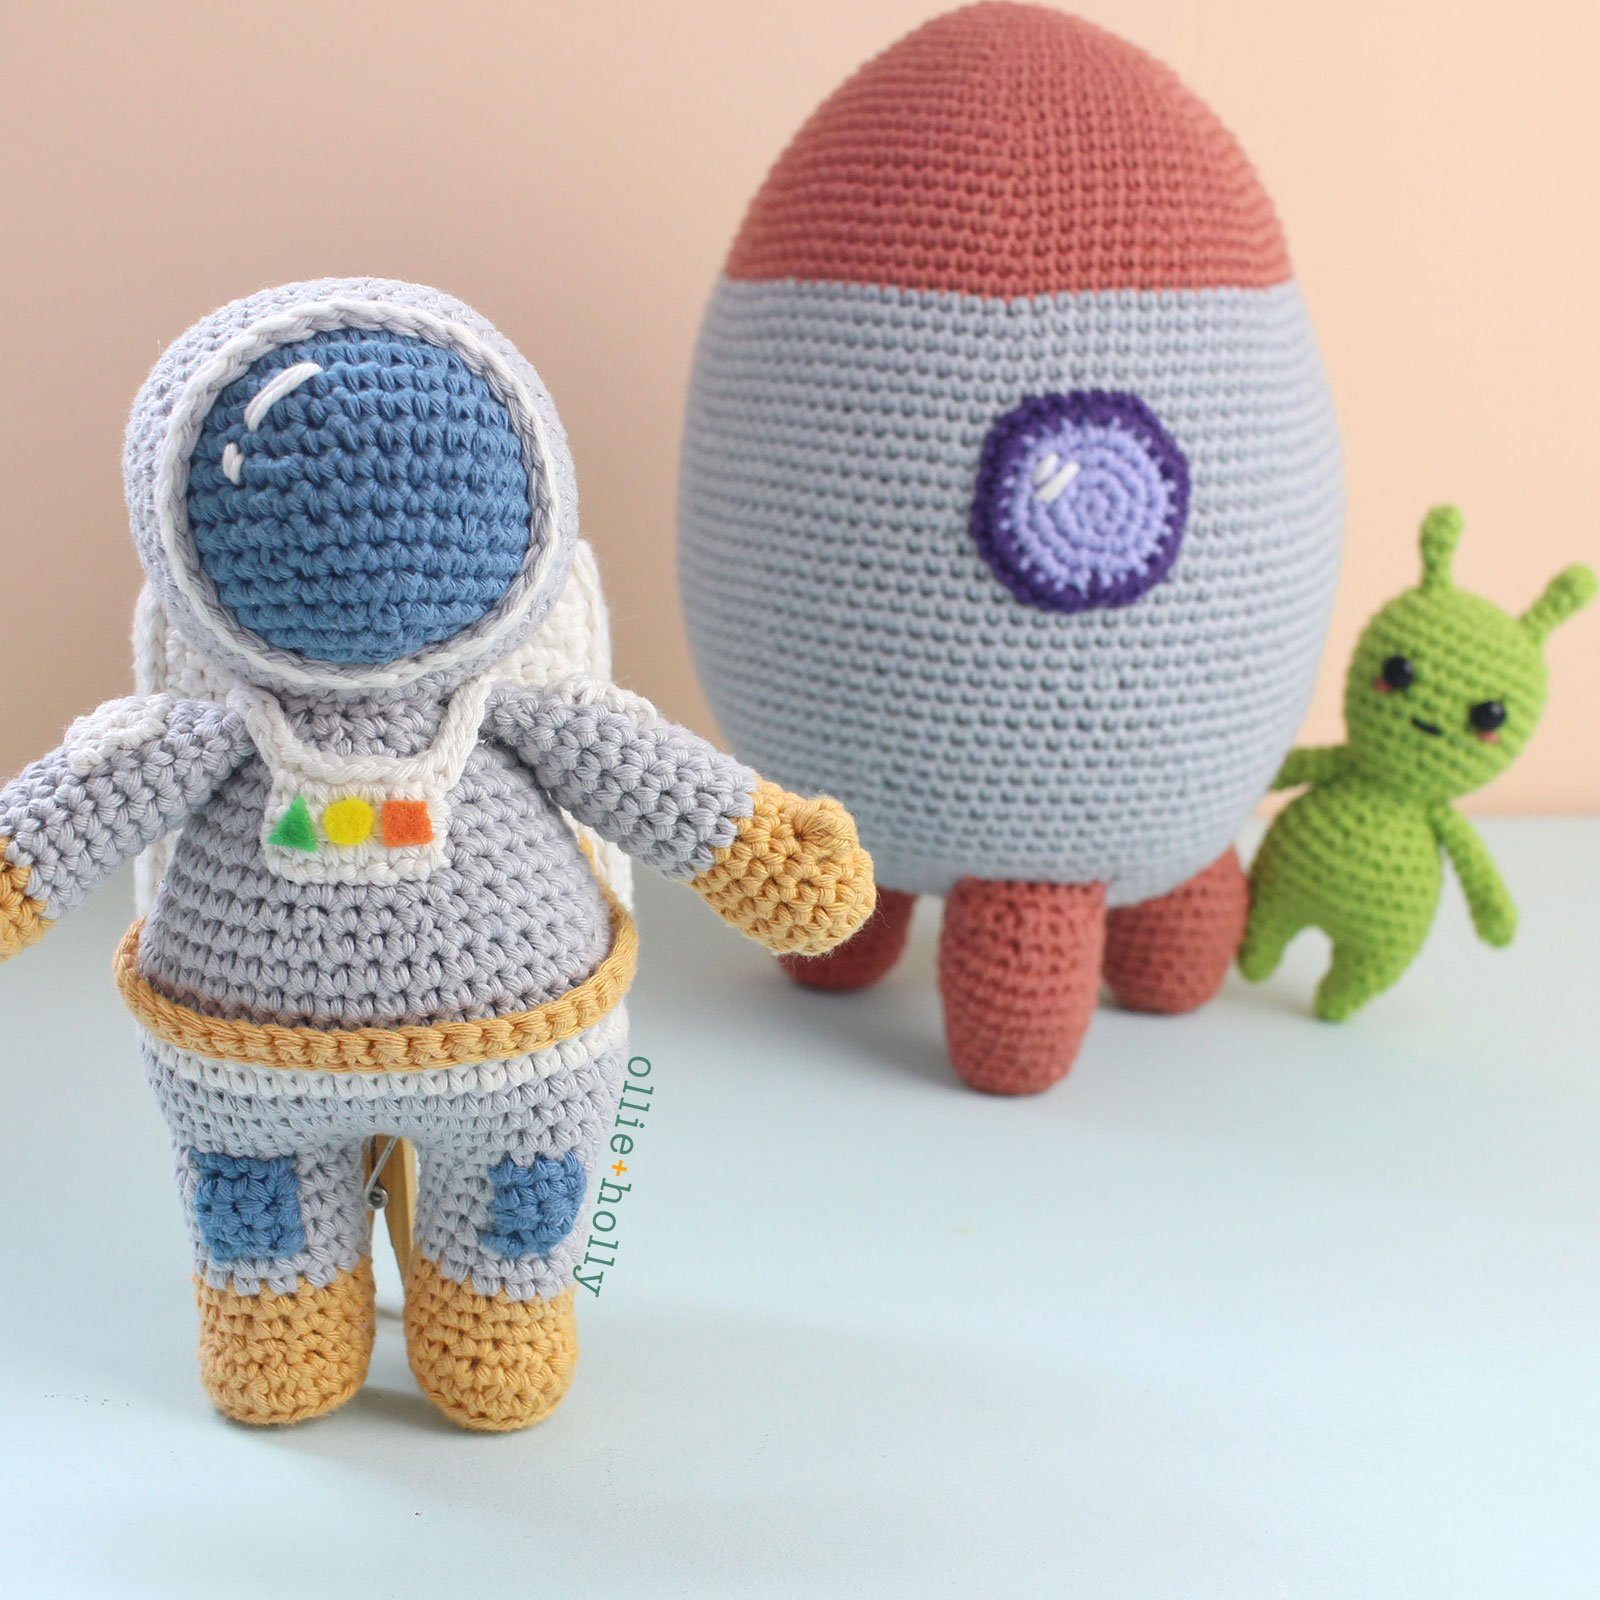 Crochet Pacman Amigurumi Toy Pattern Unusual & Easy Crochet Patterns   1600x1600